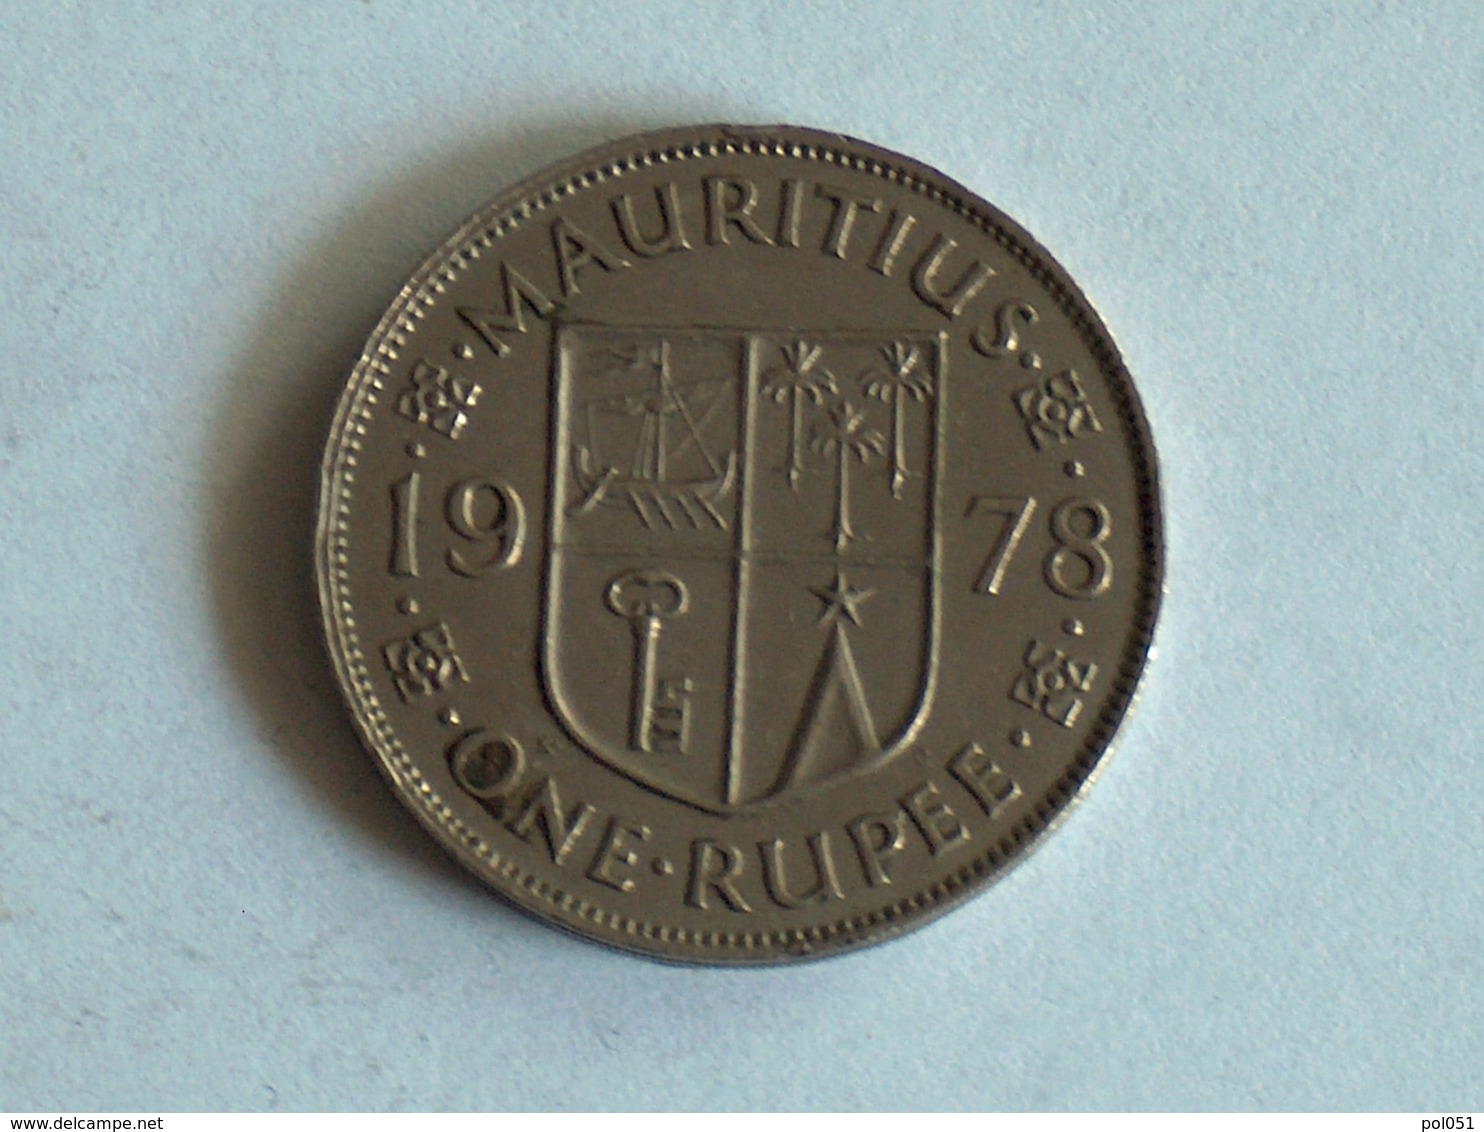 Mauritanie 1 Rupee 1978 - Mauritanie